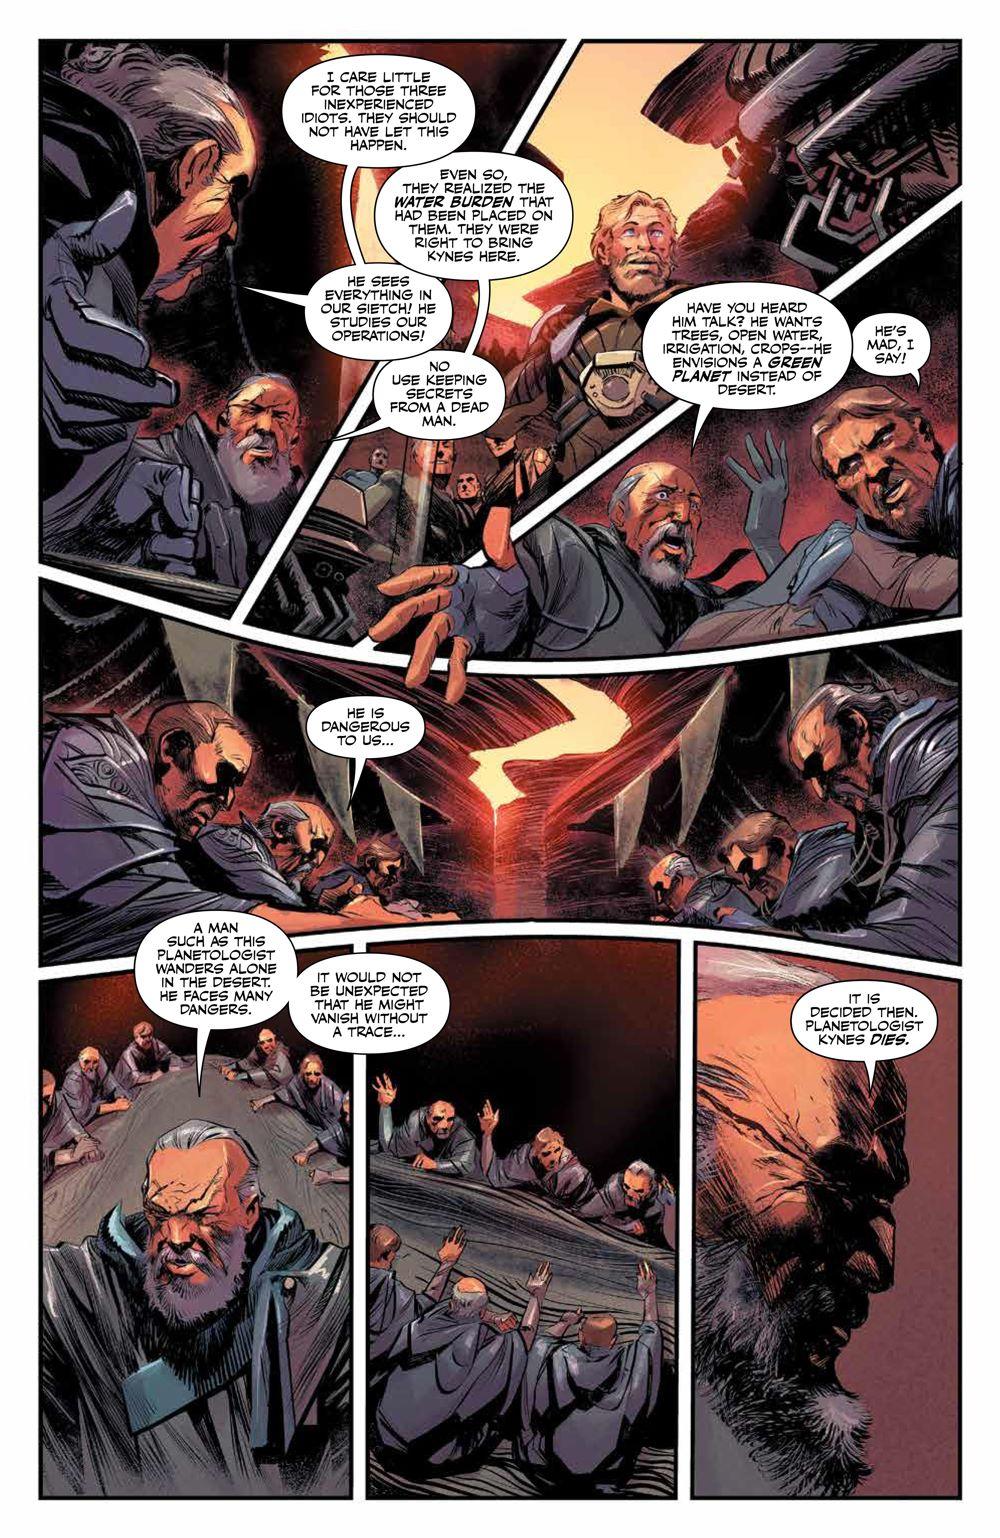 Dune_HouseAtreides_005_PRESS_4 ComicList Previews: DUNE HOUSE ATREIDES #5 (OF 12)